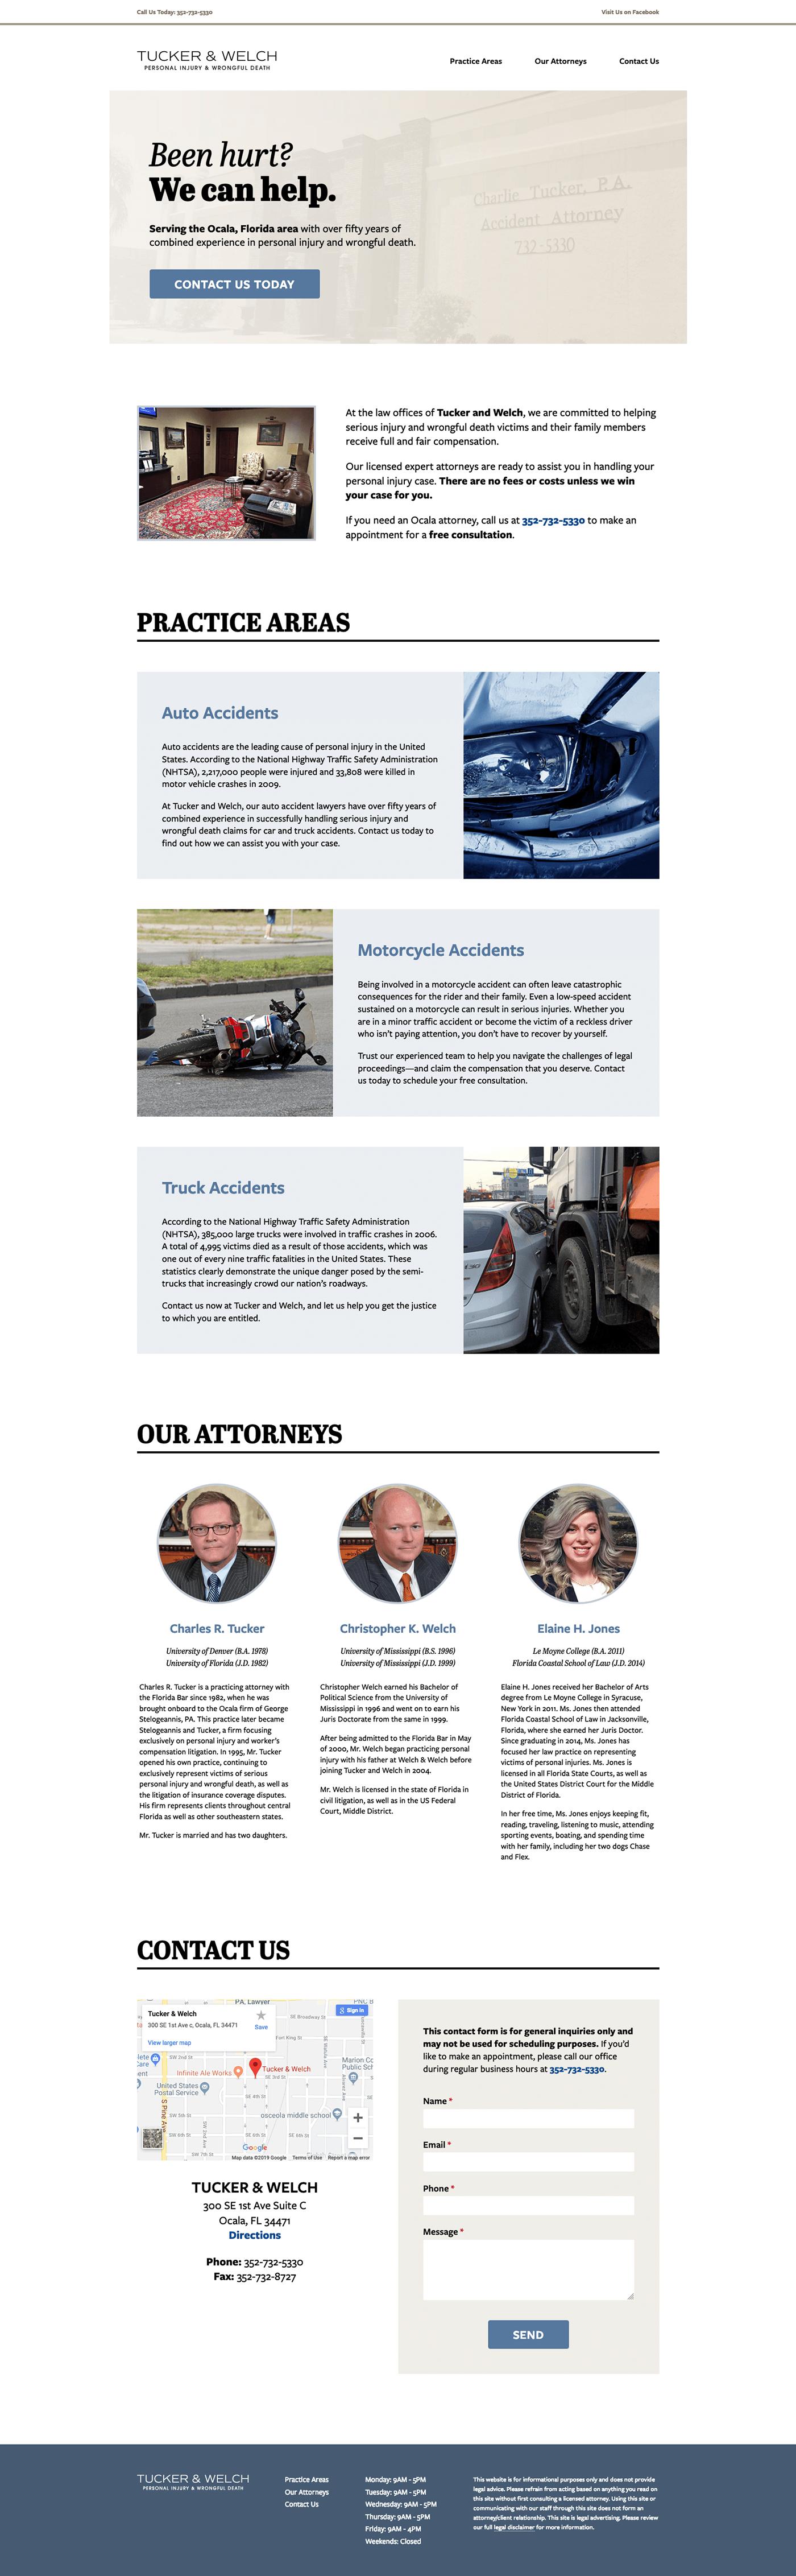 Web Design  web development  wordpress Law Office law firm attorney lawyer legal